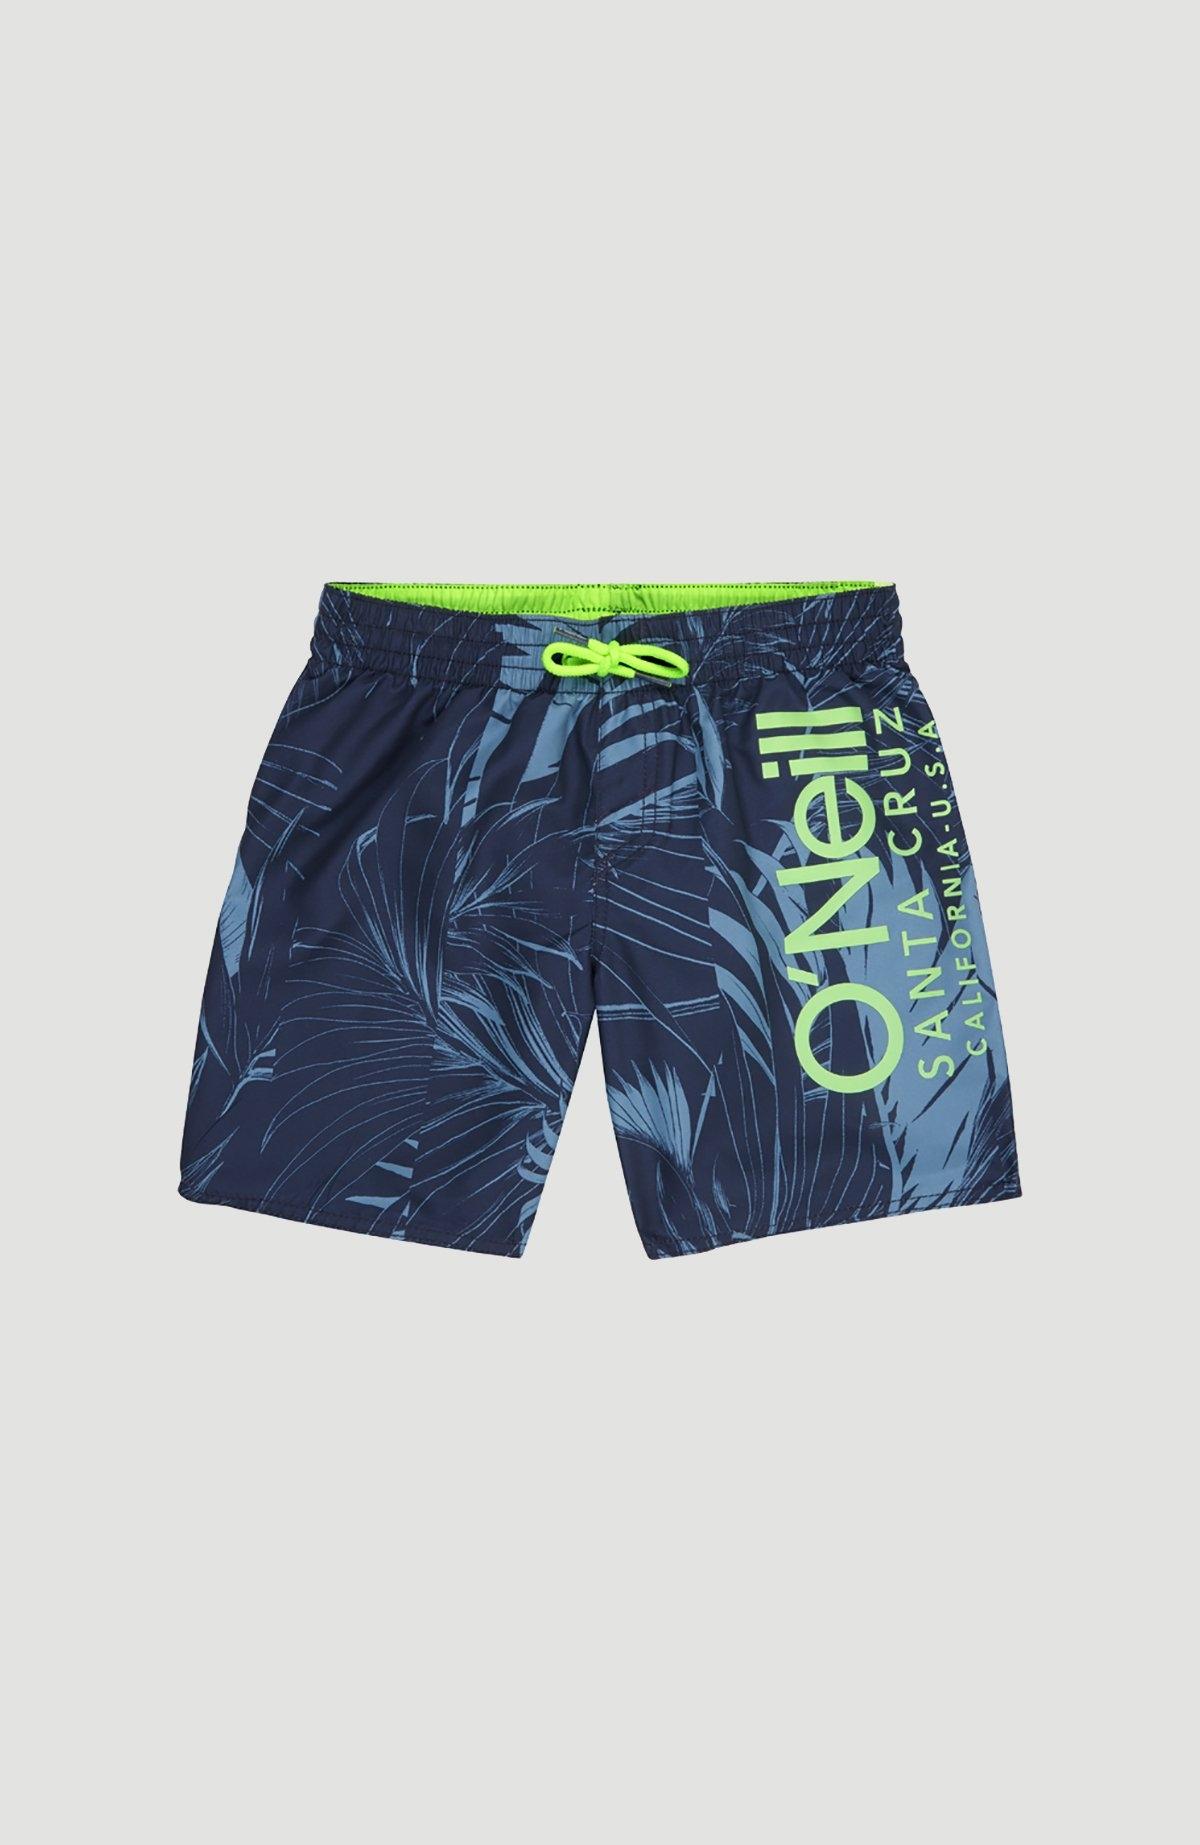 O'neill zwemshort »Cali floral« nu online kopen bij OTTO